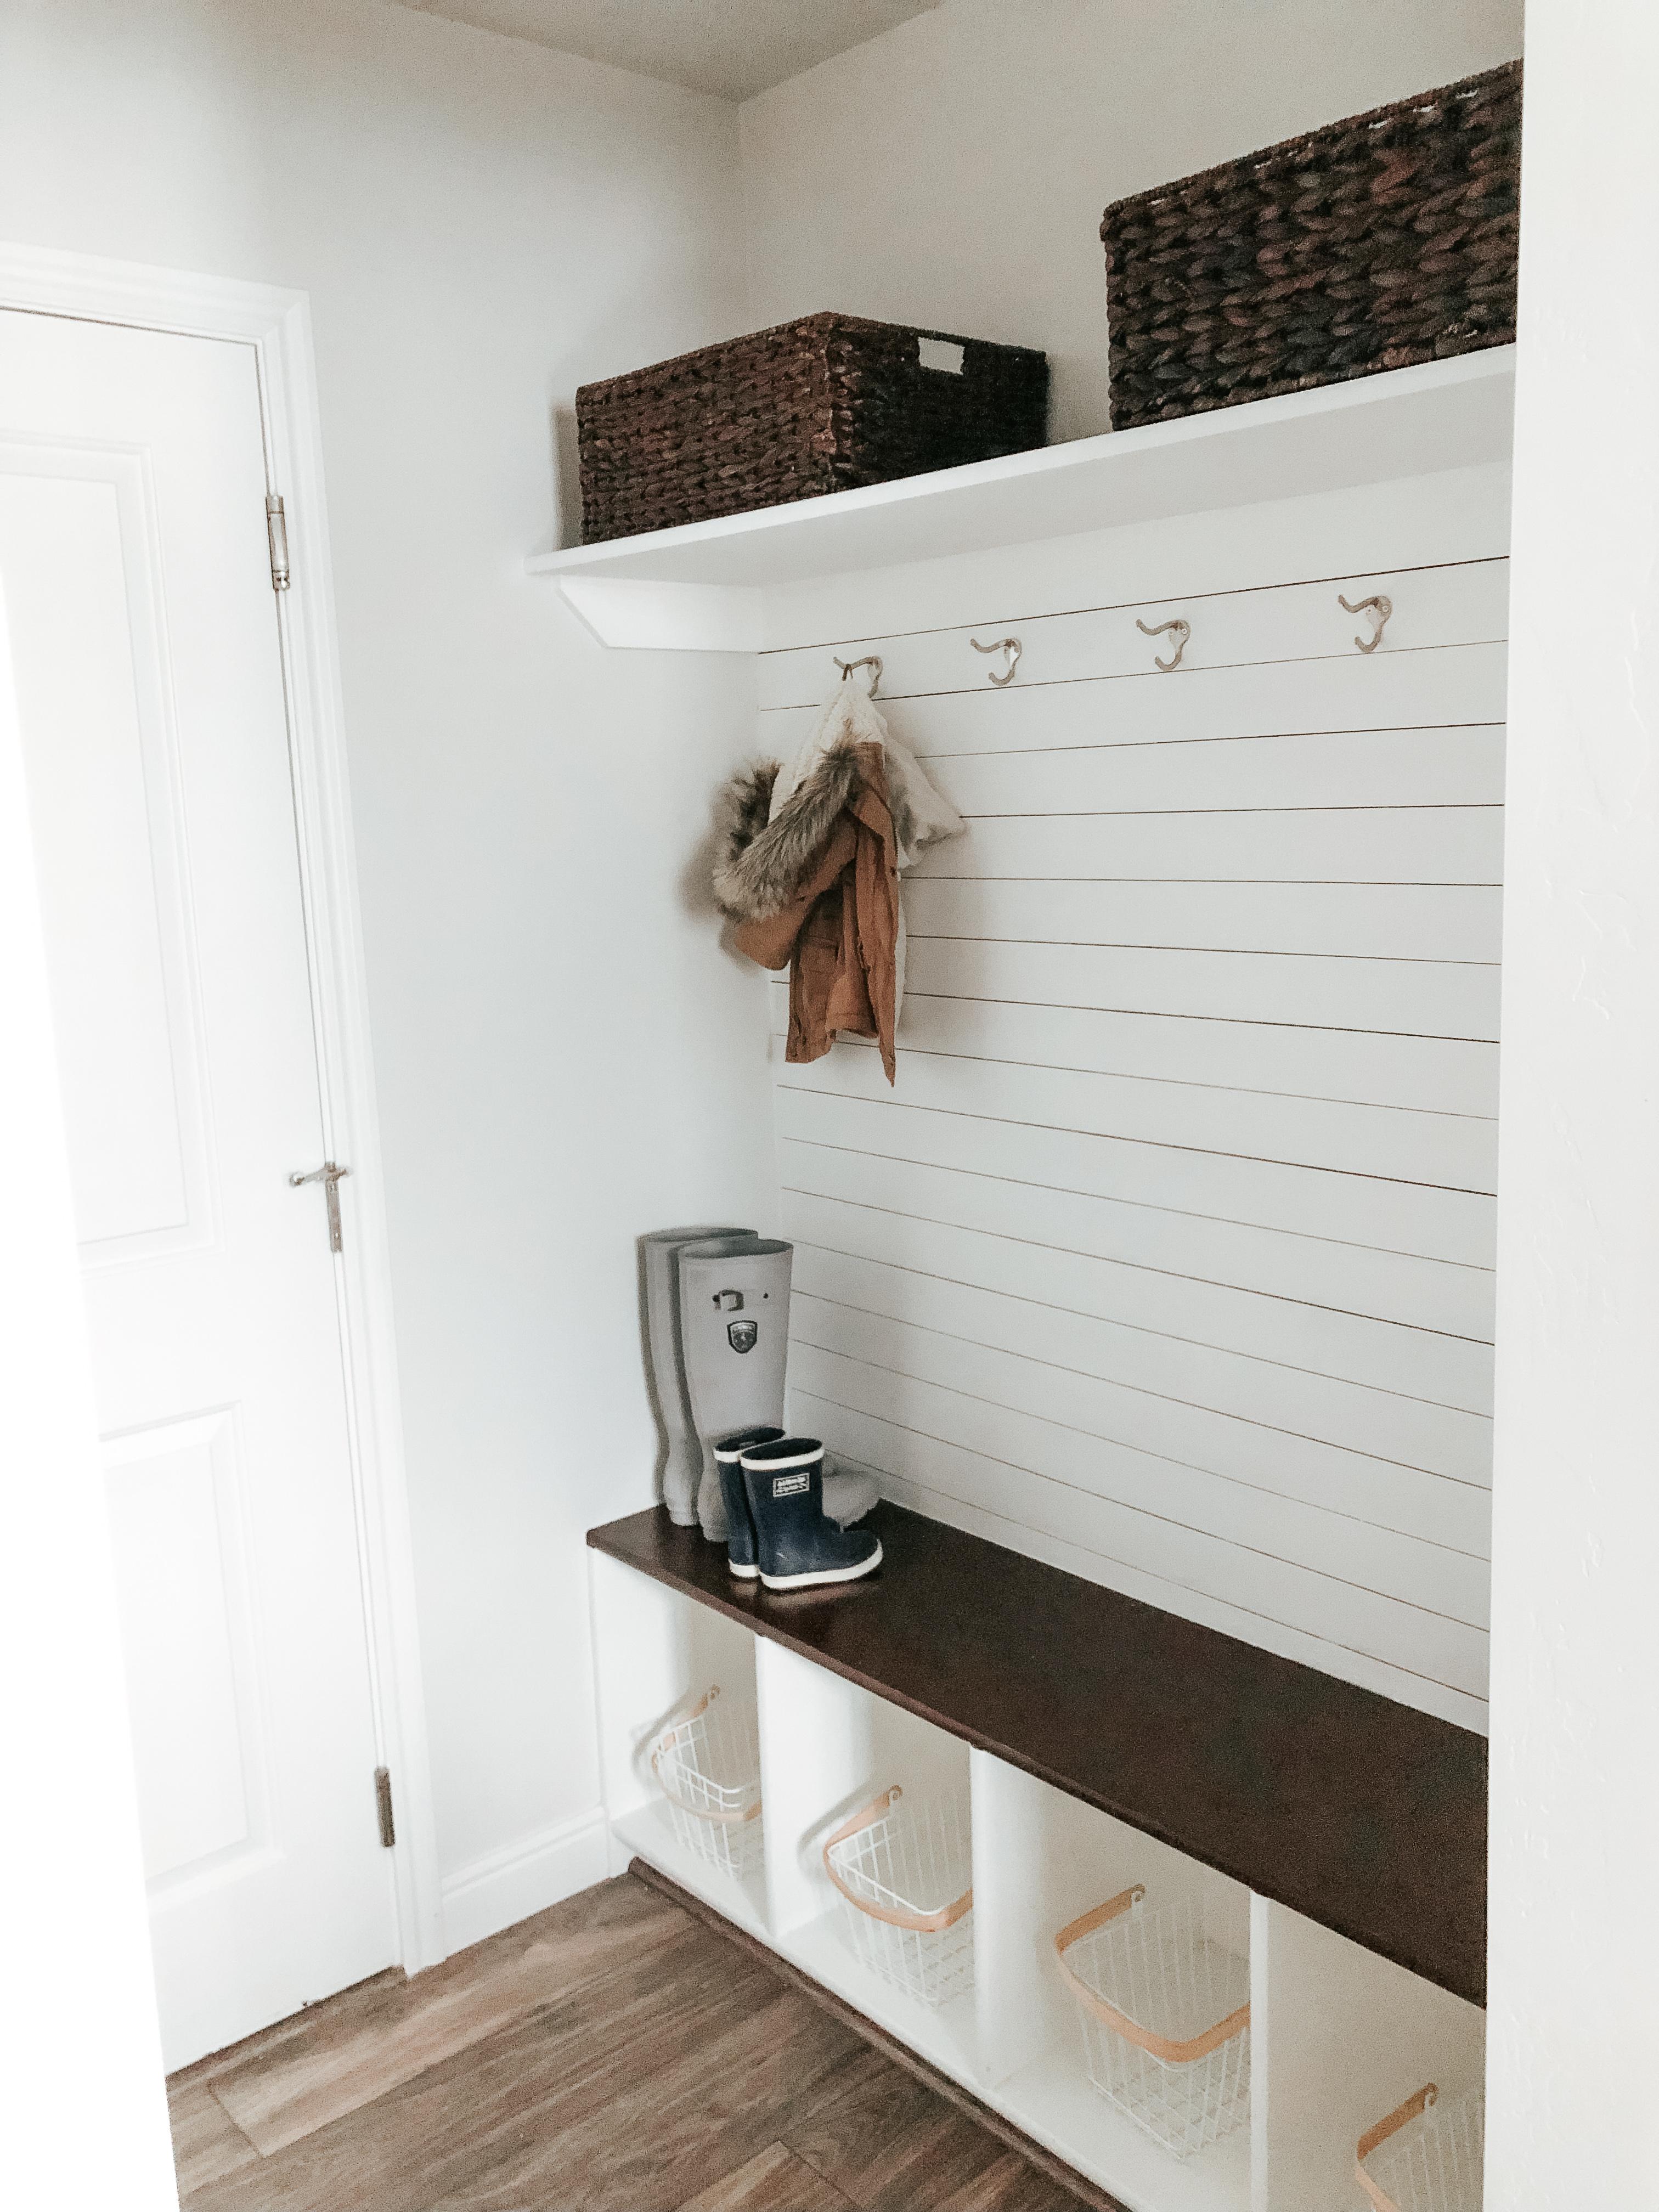 Mud Room Decor Under $100